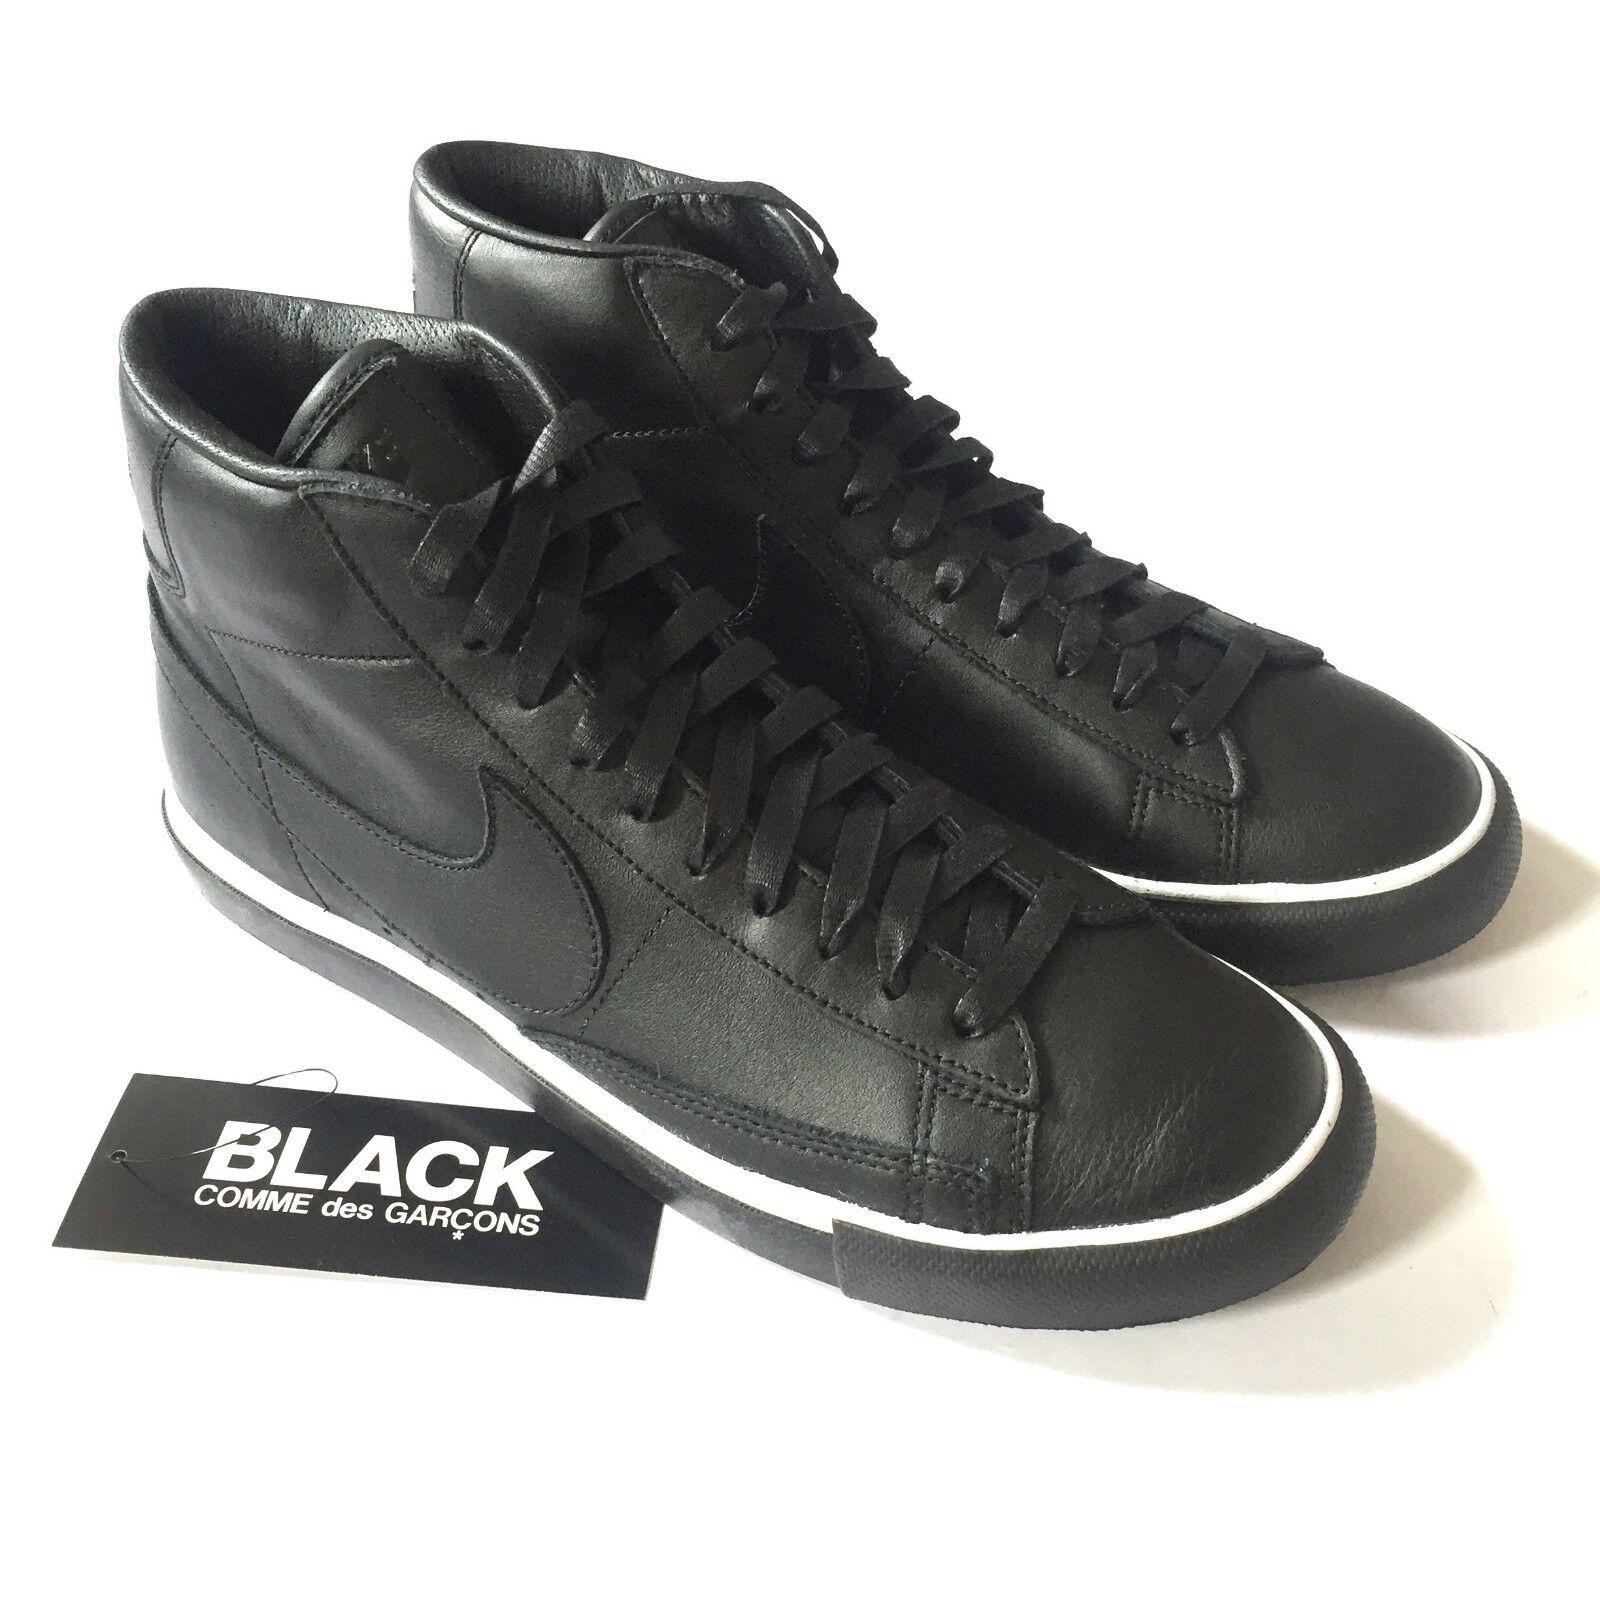 Nwt comme des garcons nike cdg giacca nera alta scarpa vera pelle.